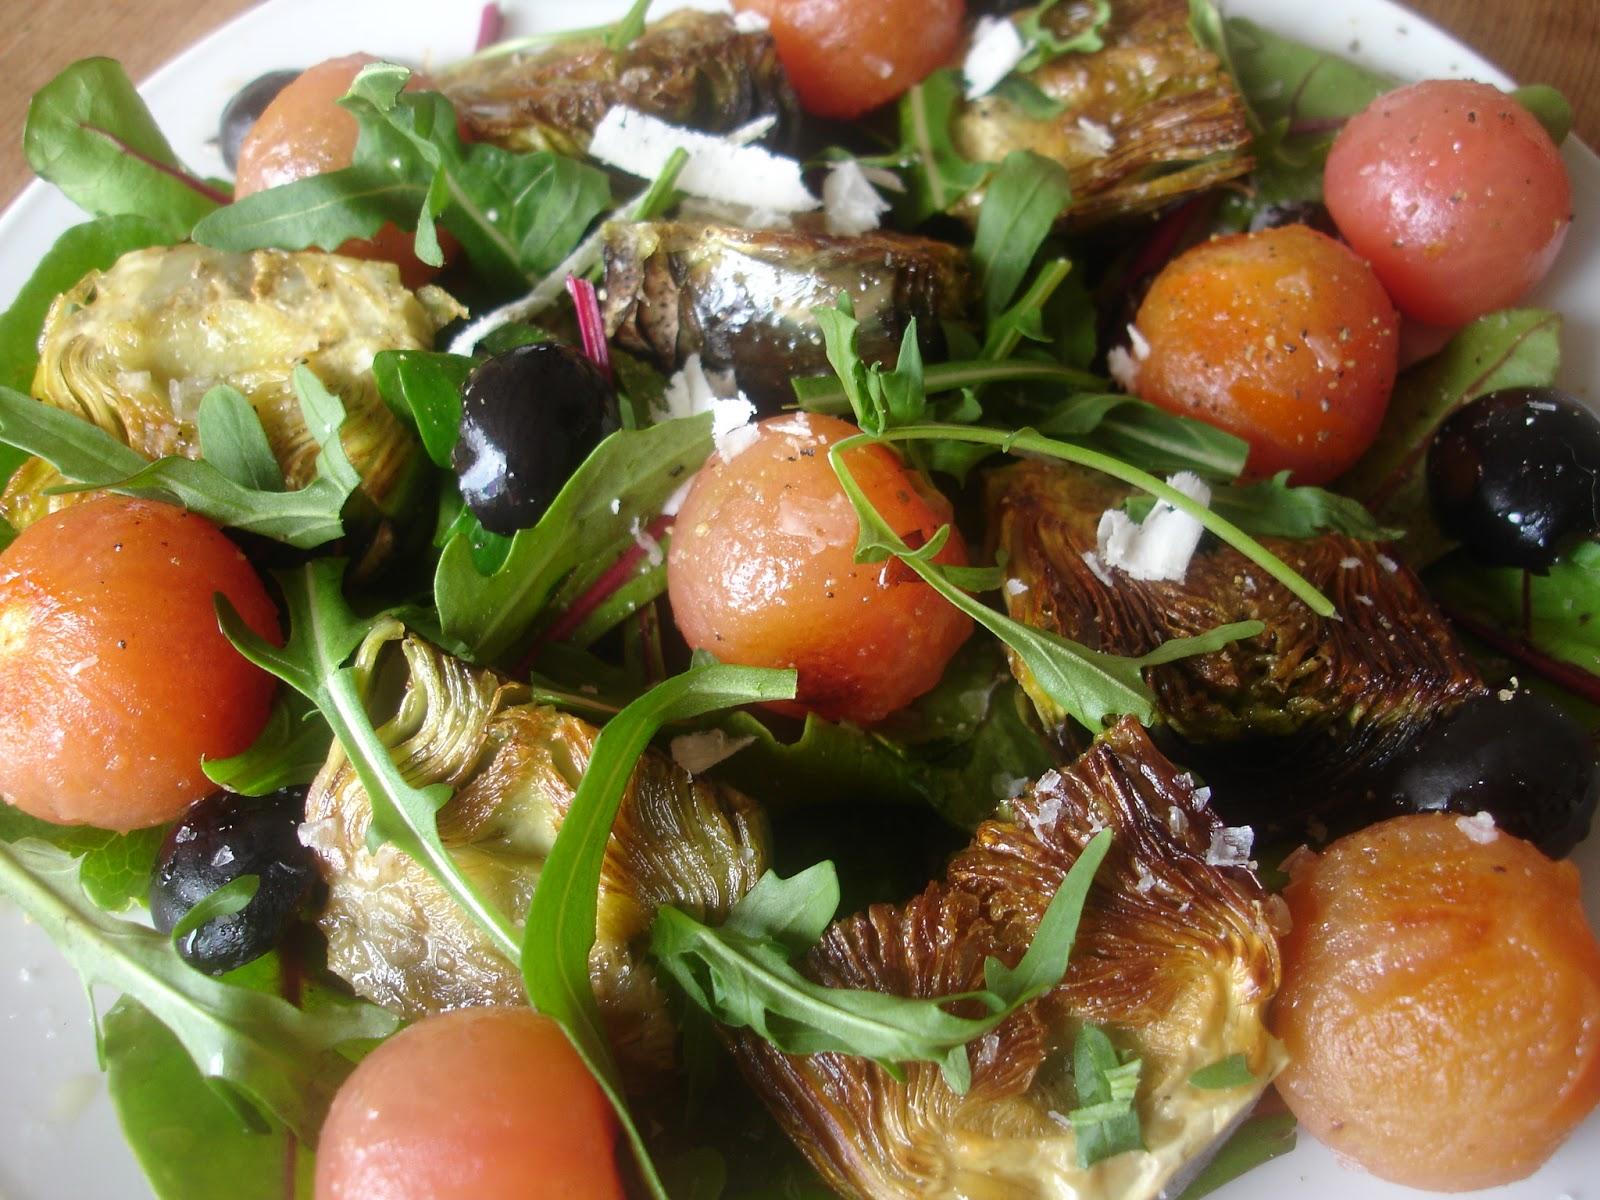 kochbuch f r max und moritz artischocken kirschtomaten salat frei nach lea linster. Black Bedroom Furniture Sets. Home Design Ideas